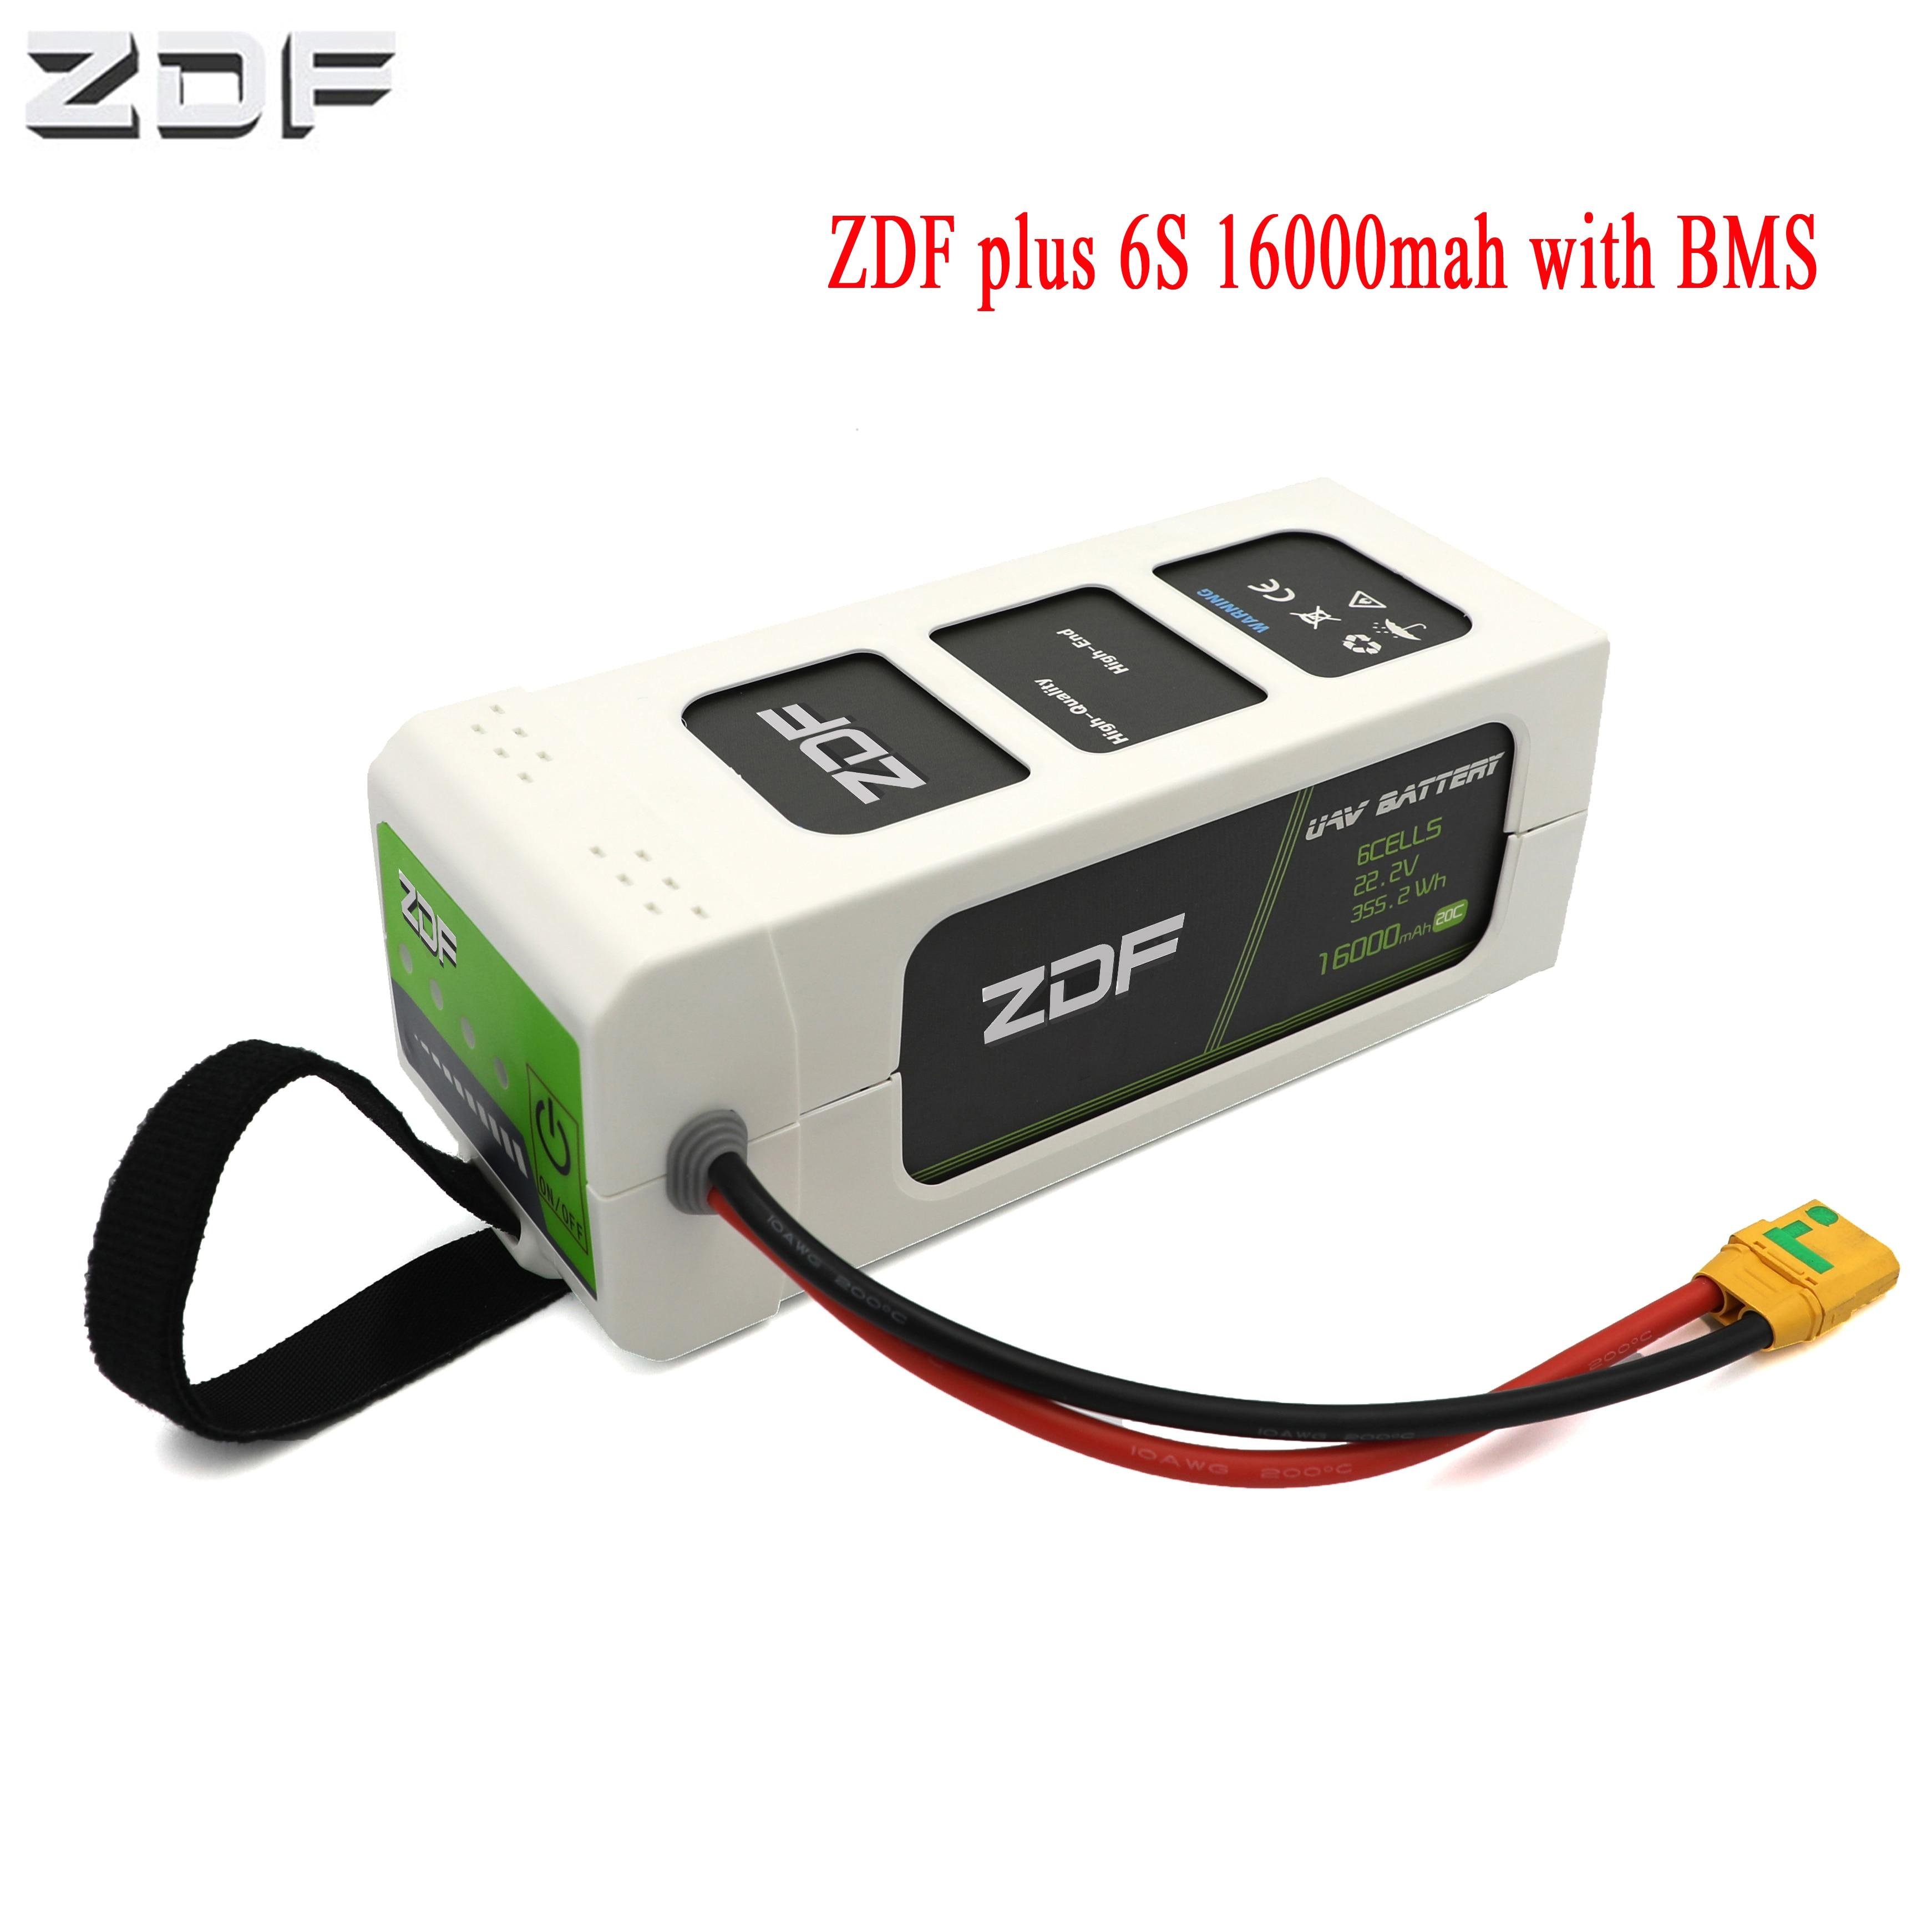 2019 nuevo PLUS ZDF 16000mAh 6S 22,2 V 6S1P 25C FPV batería Lipo inteligente con BMS para Dron RC